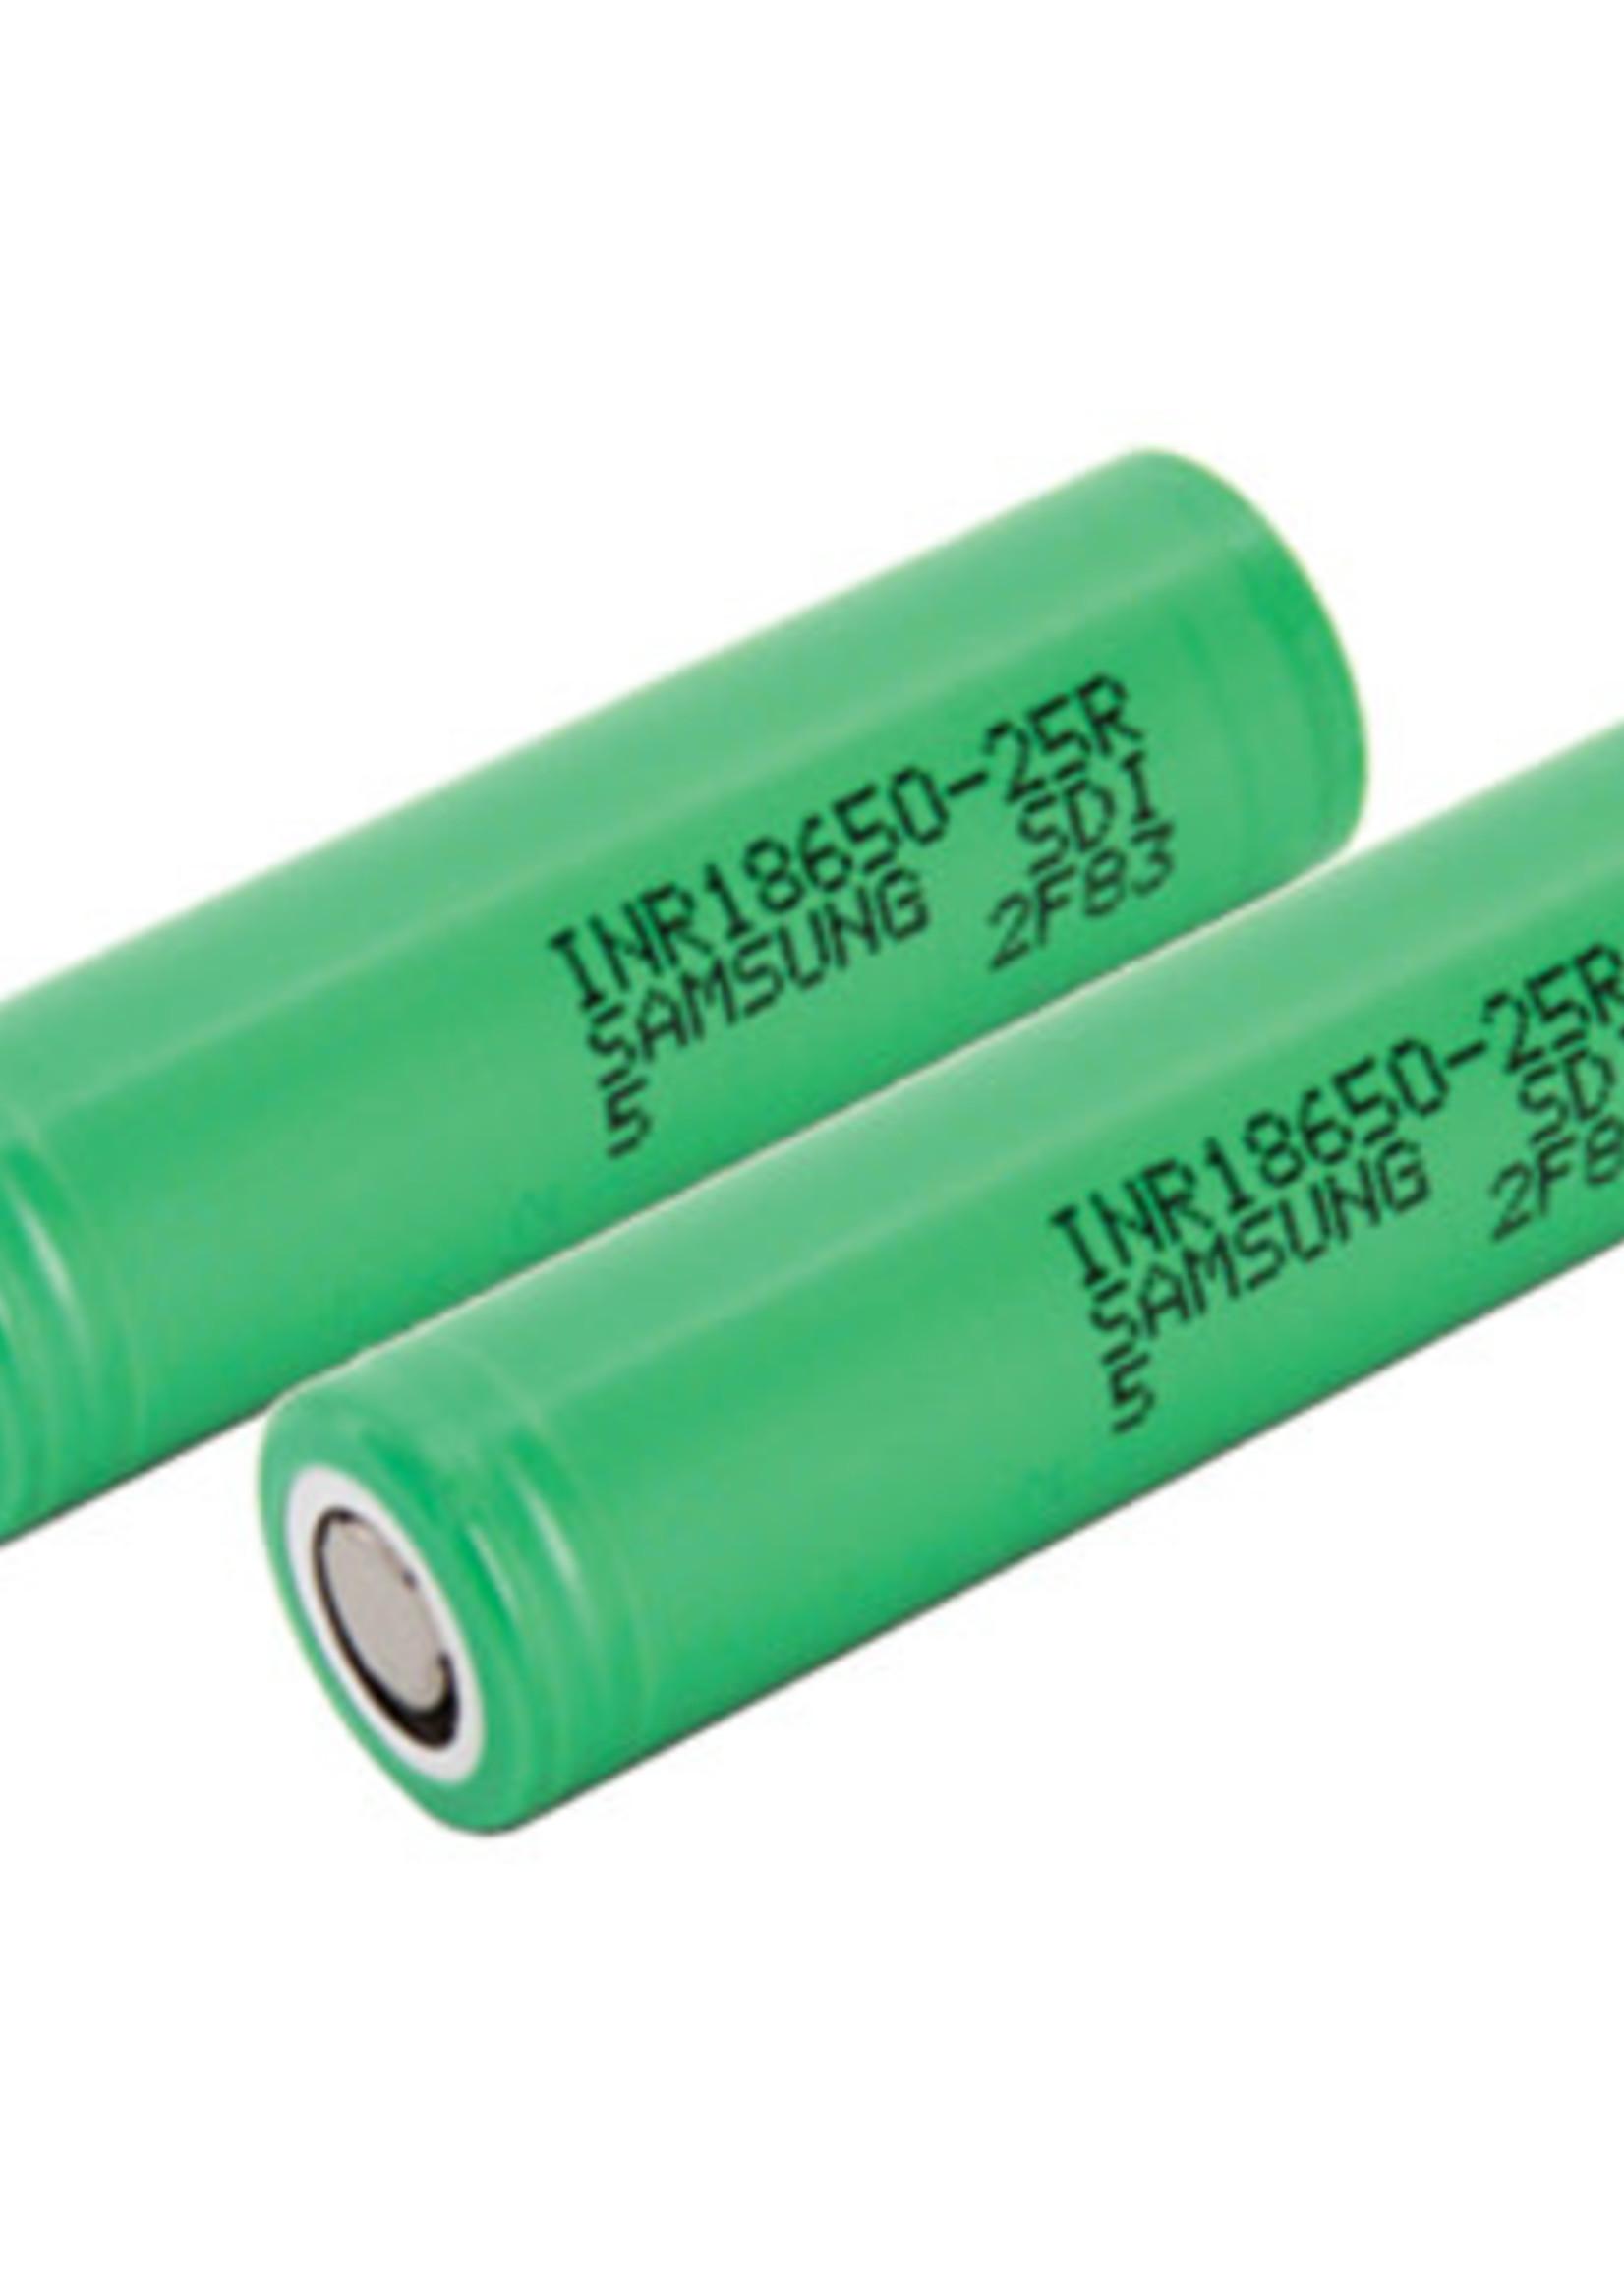 Samsung battery - 25R